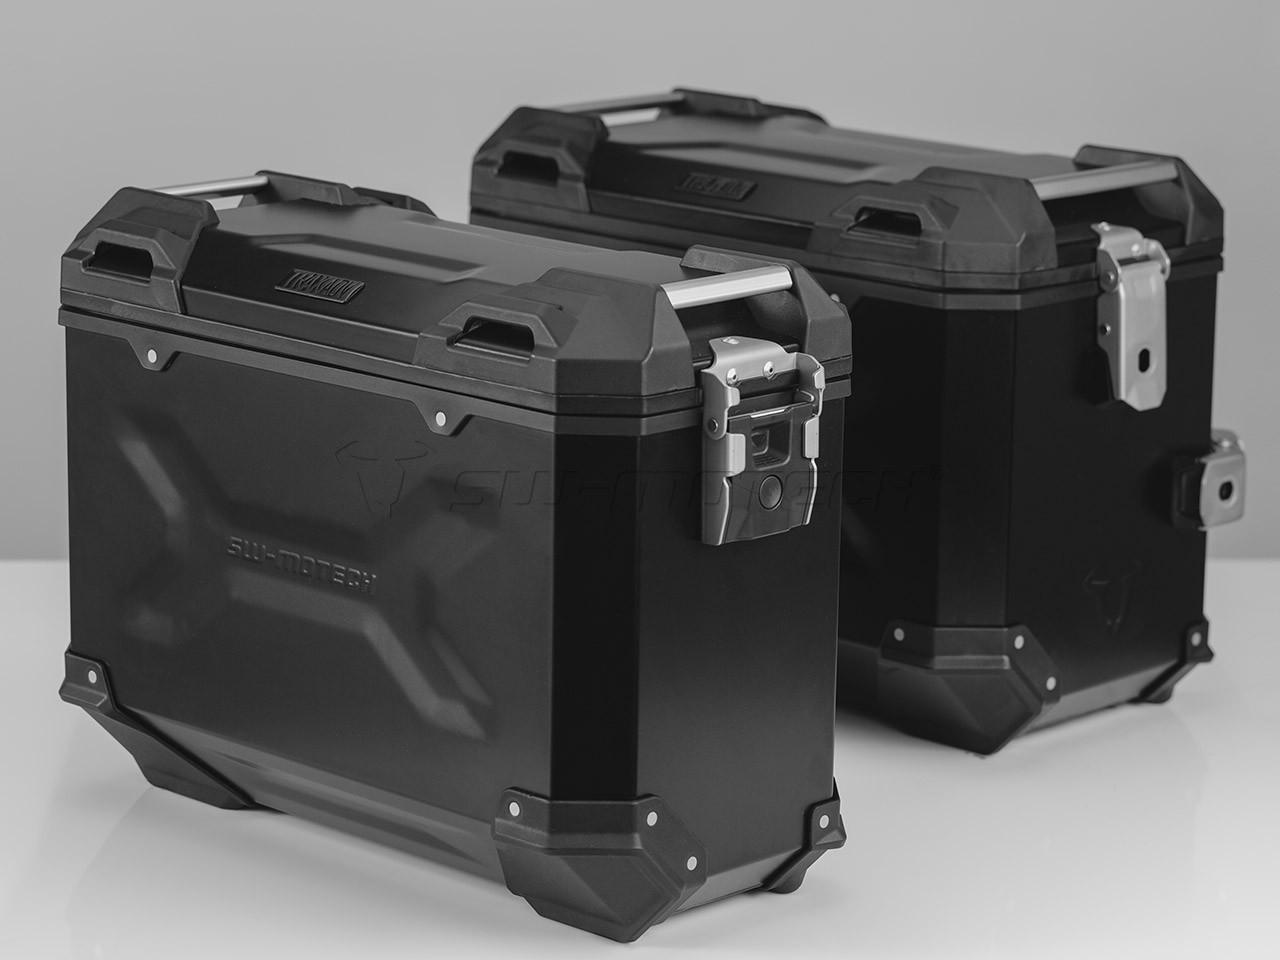 Triumph Tiger 1050 Sport (13-) - sada bočních kufrů TRAX Adventu